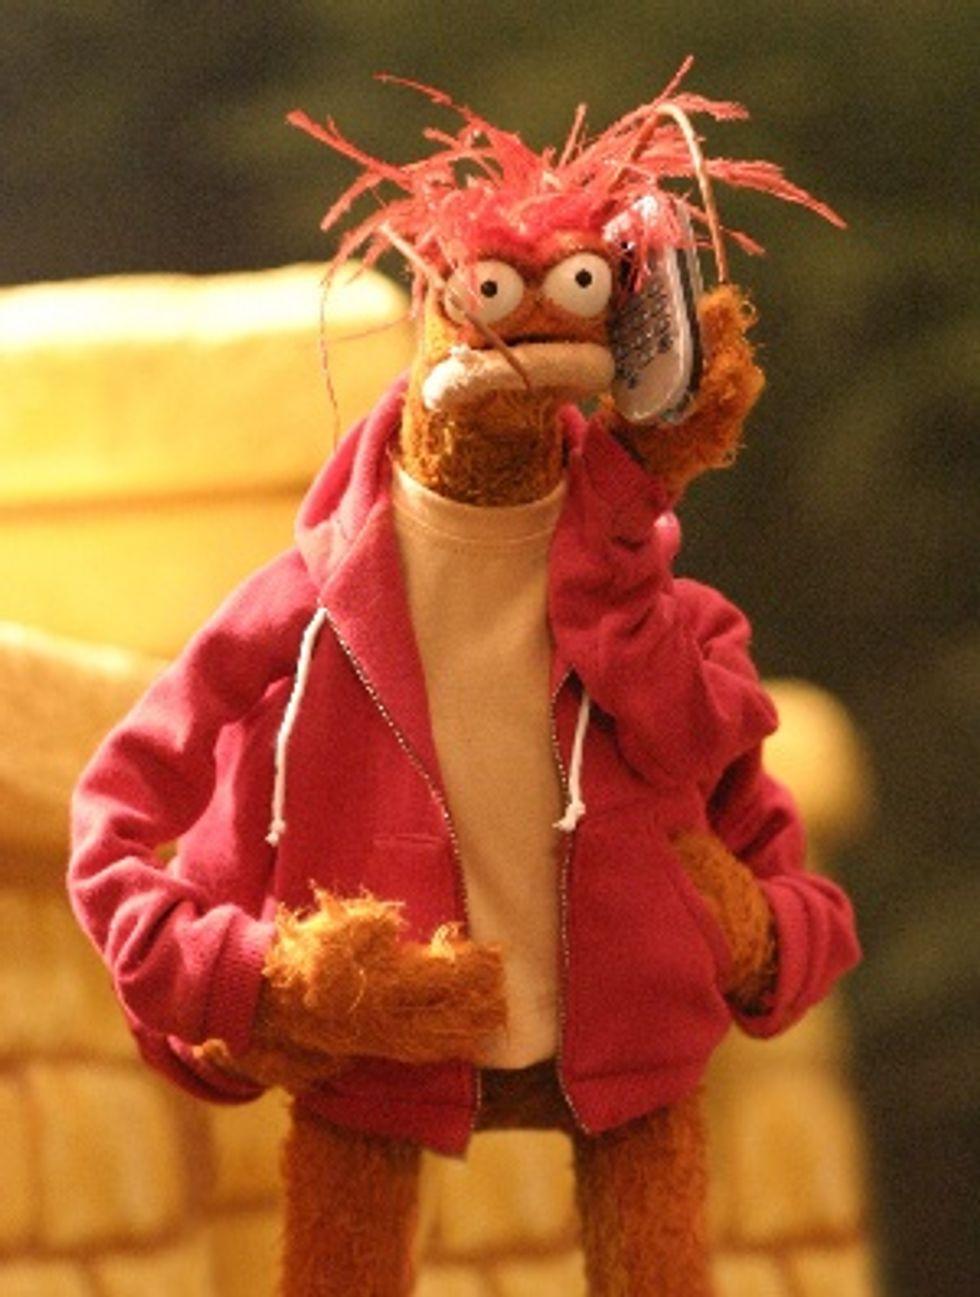 Just Cuz: Pepe the King Prawn Muppet